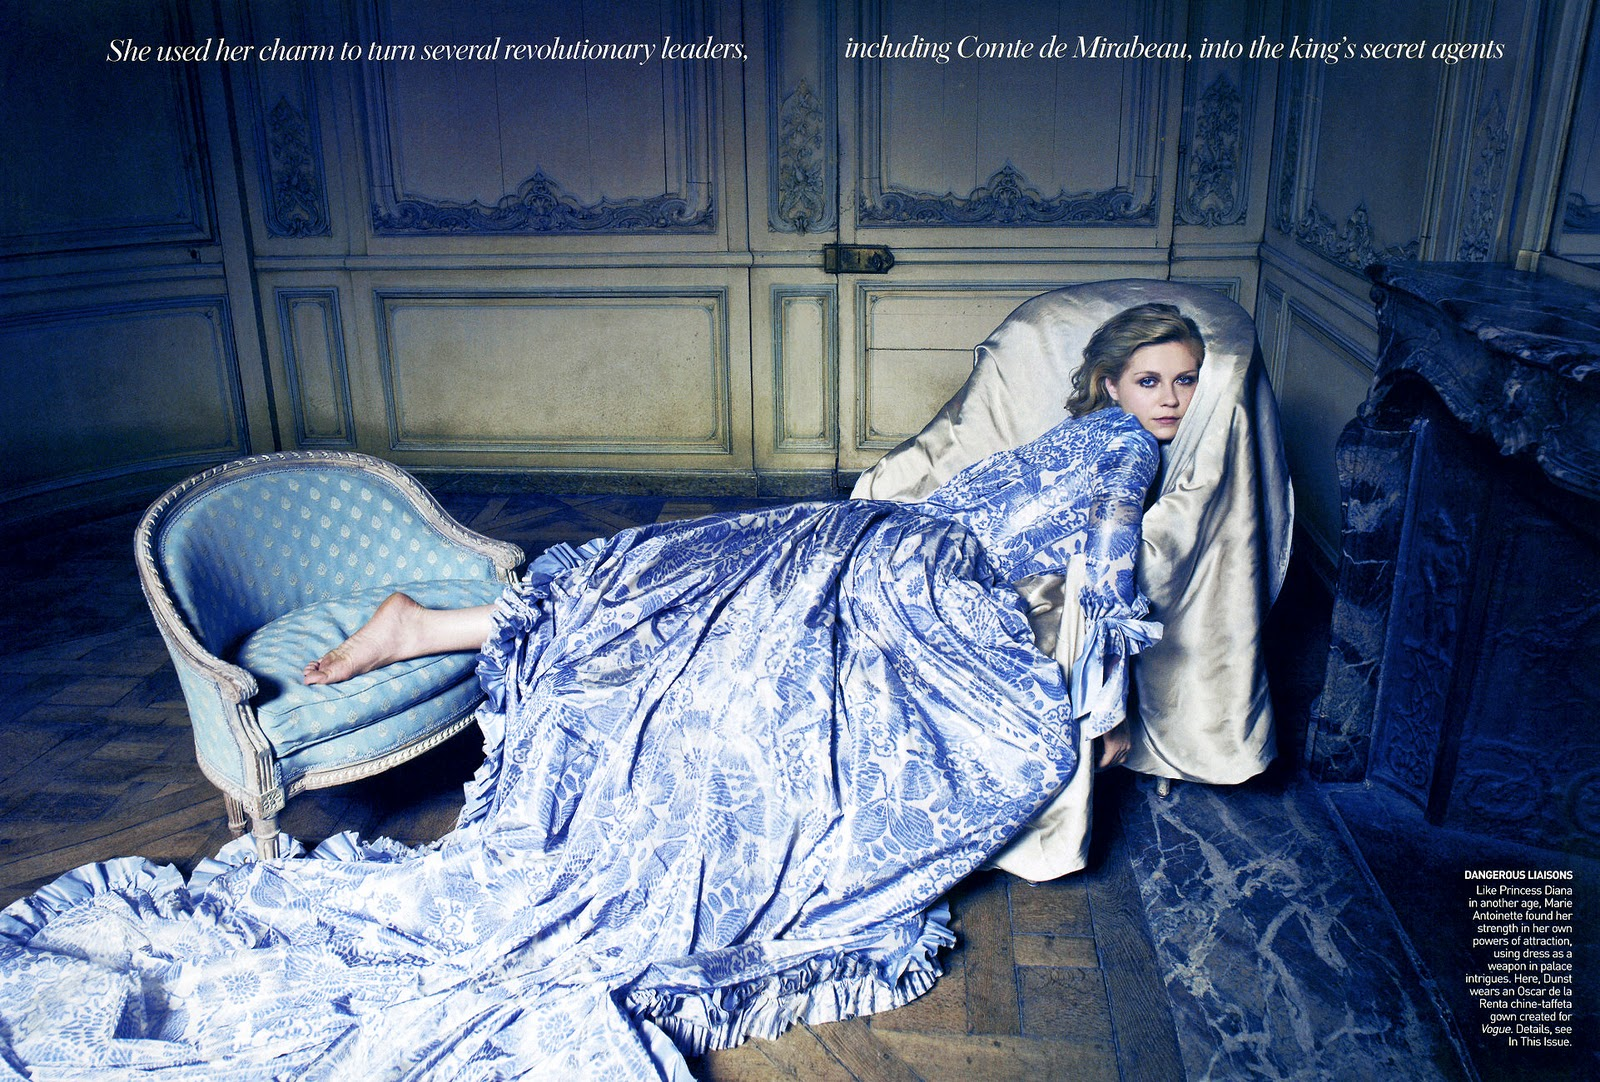 chanel after coco coup de coeur vogue september 2006 marie antoinette. Black Bedroom Furniture Sets. Home Design Ideas